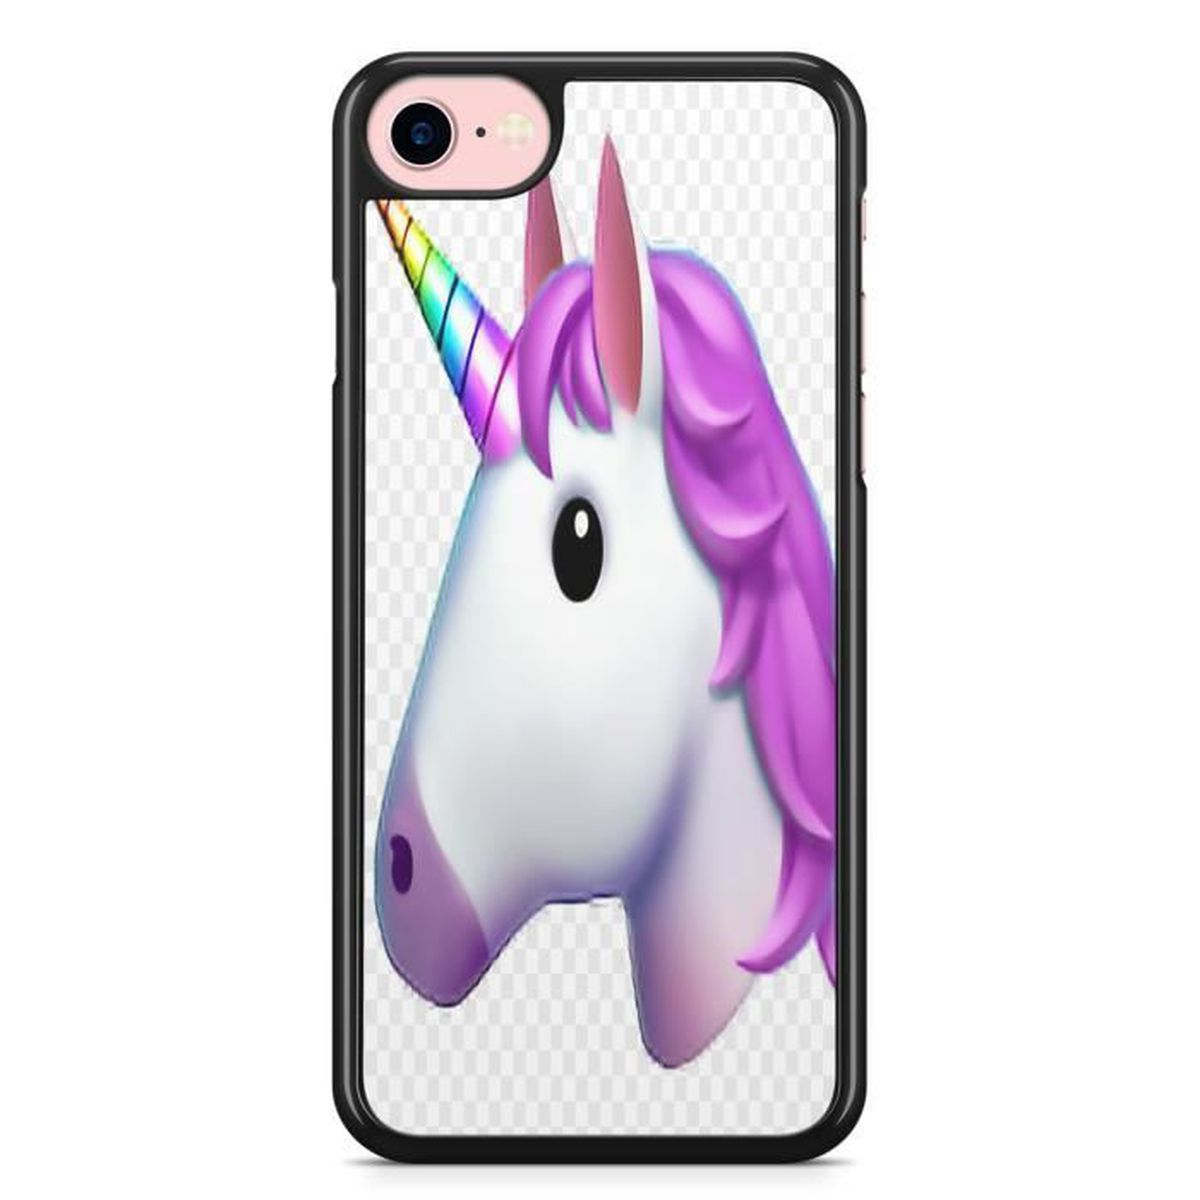 coque iphone 4 4s tete de licorne fille princesse